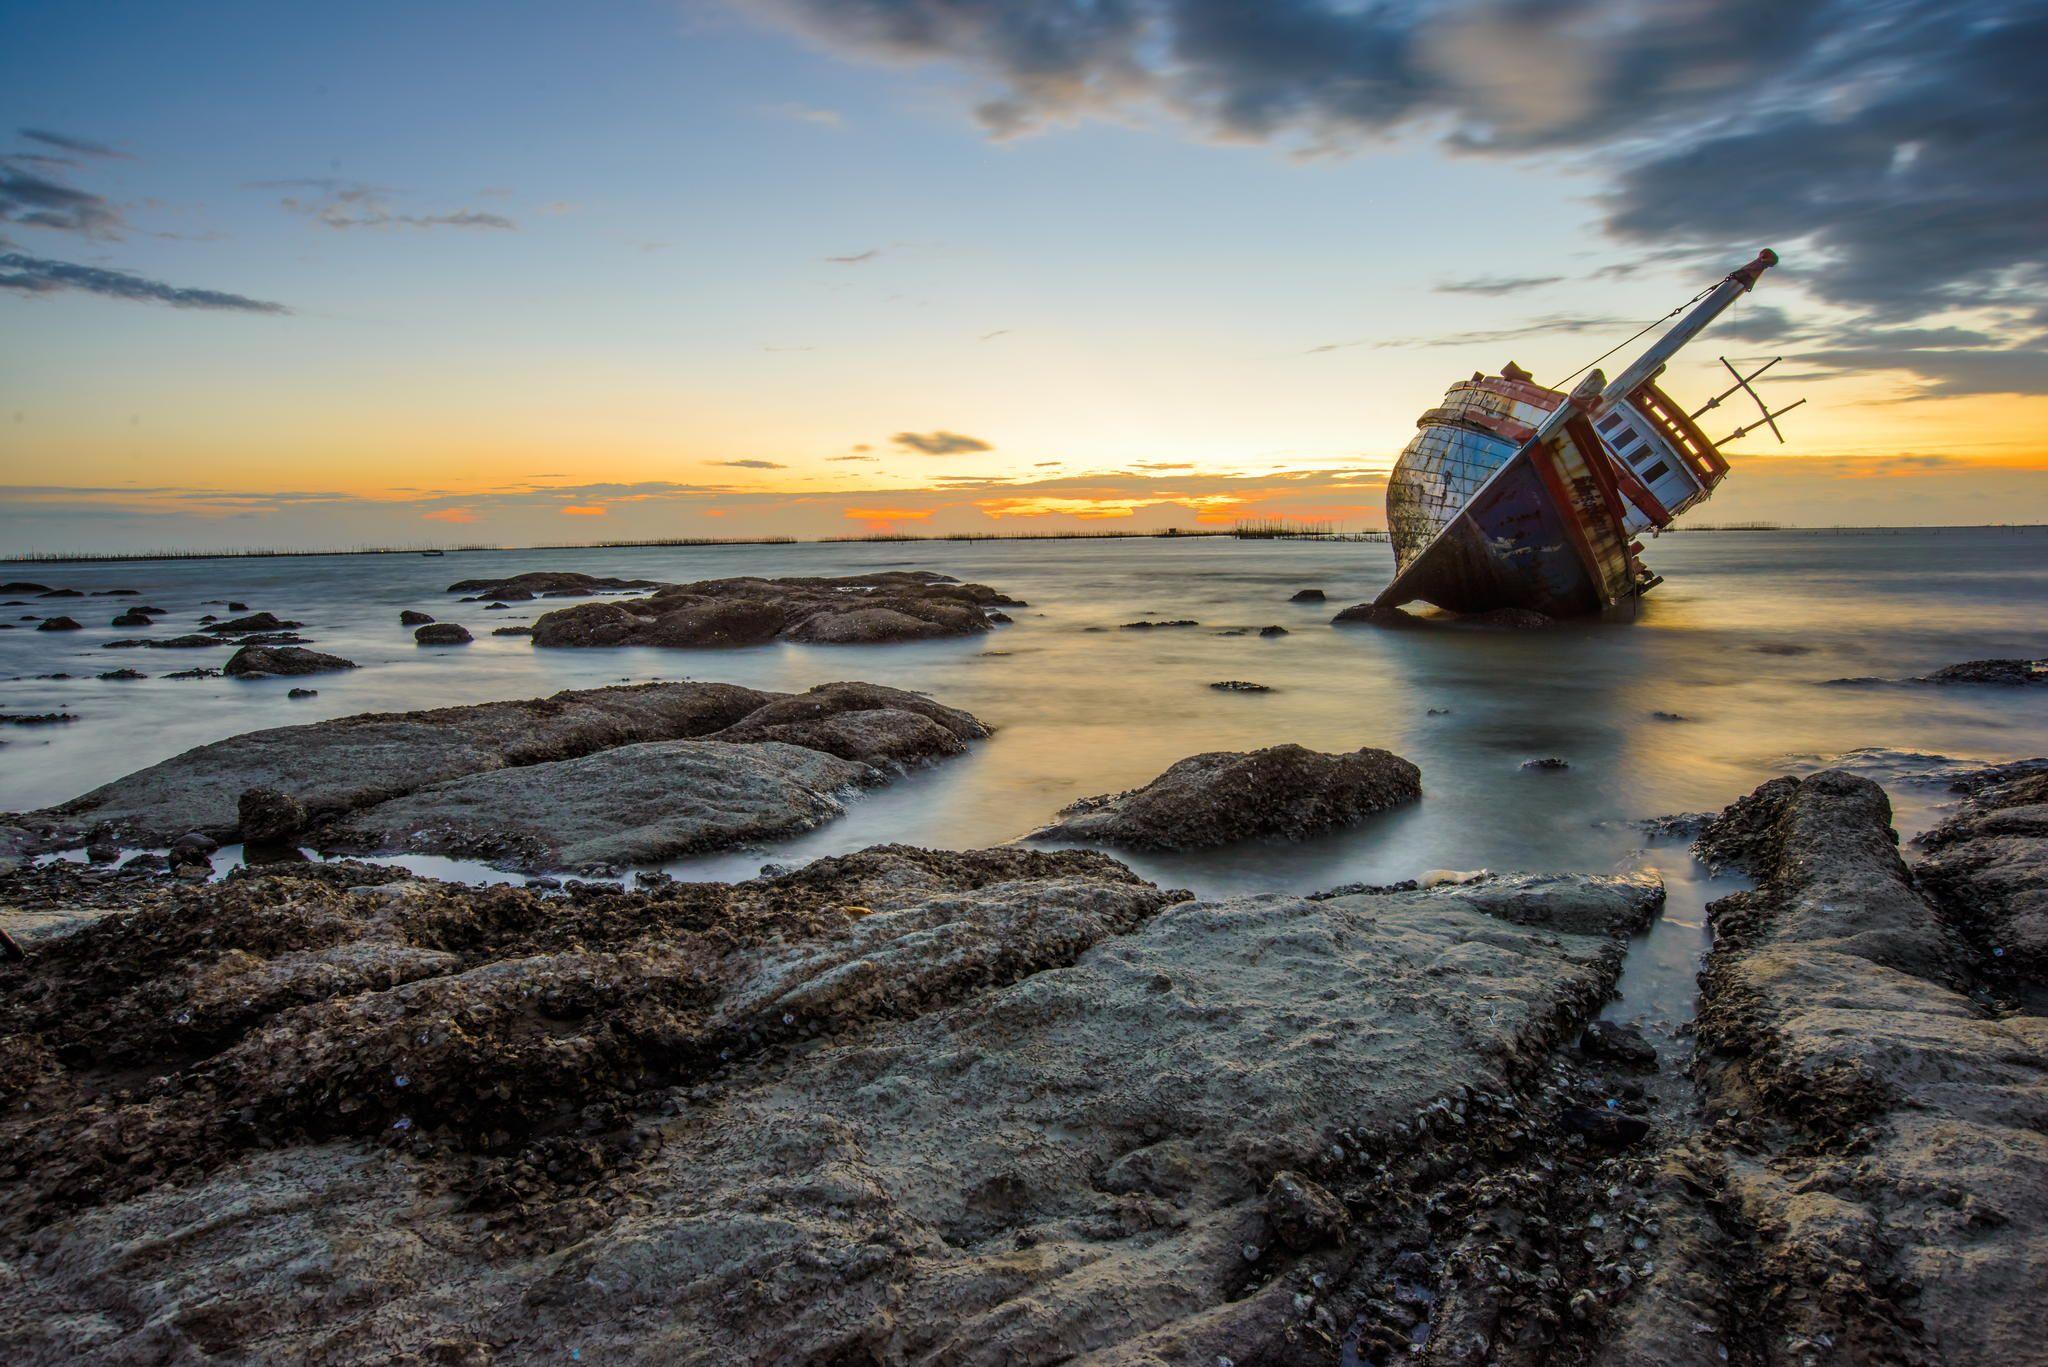 Shipwreck in thailand,Chonburi by Chu Suttisak Laohateeranon on 500px